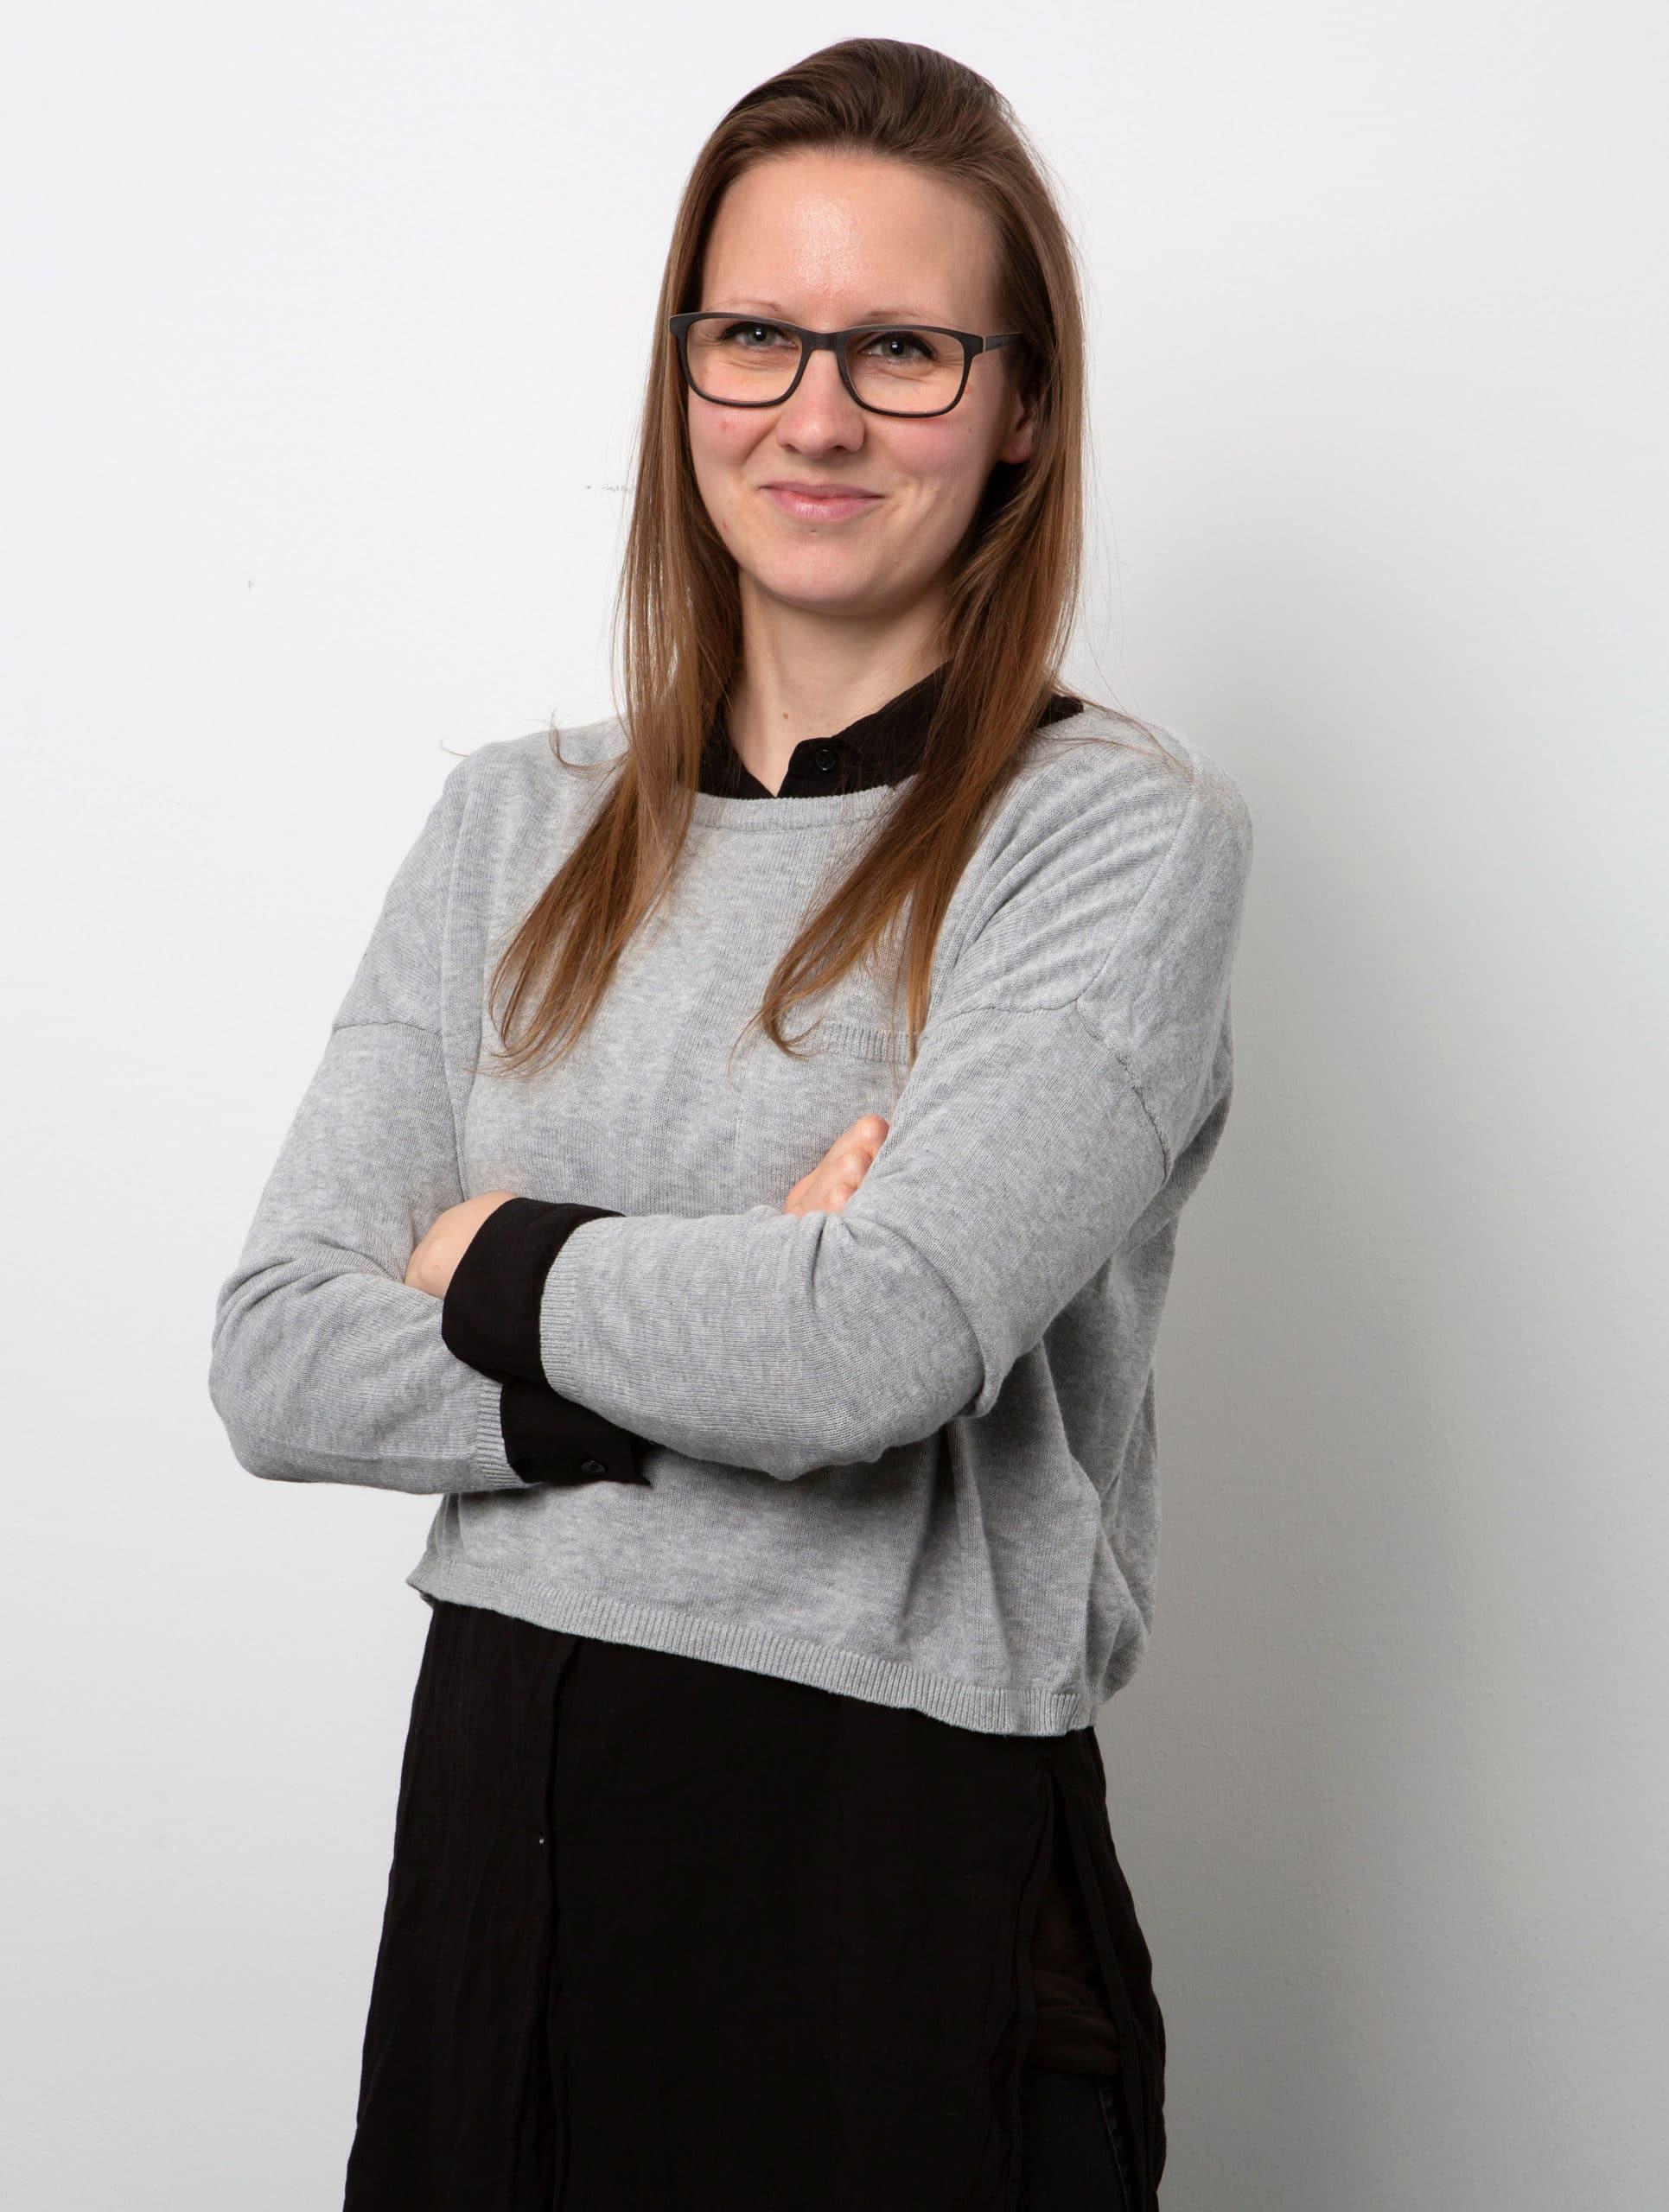 Martina Rudolph